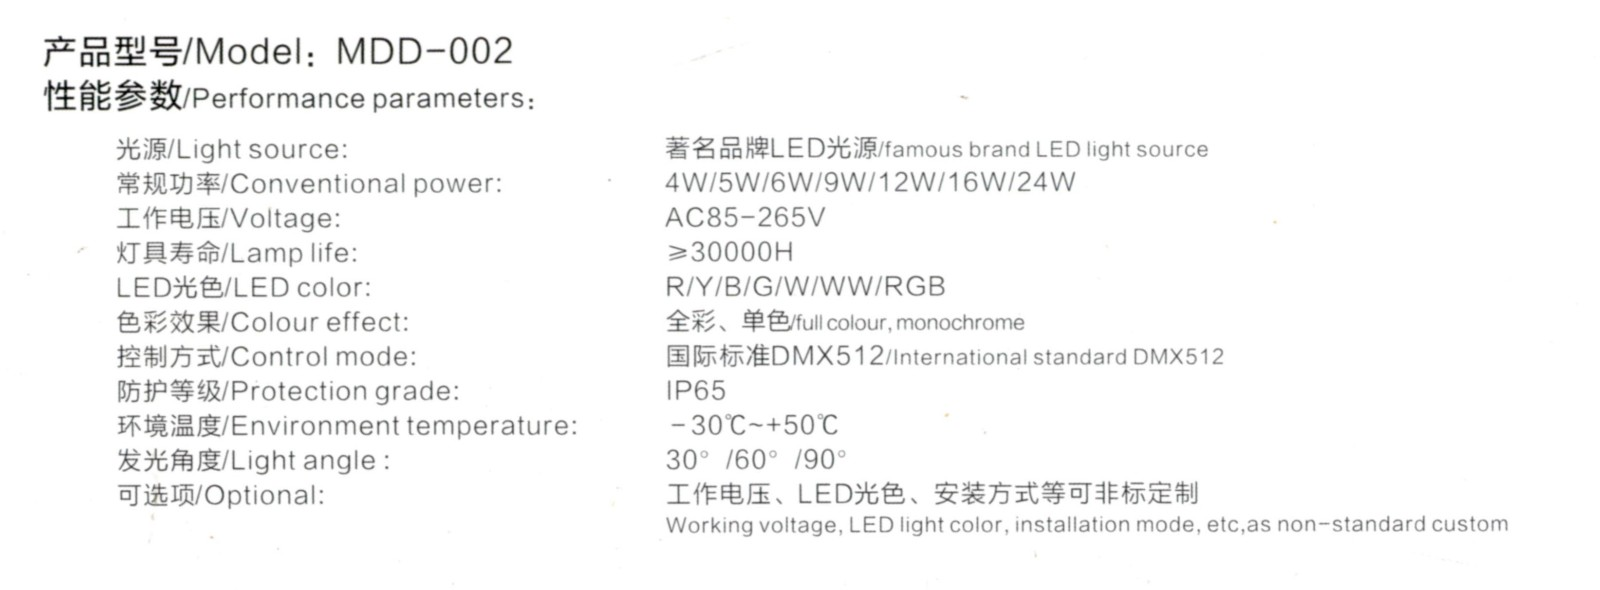 LED埋地灯Model∶MDD-002参数.jpg